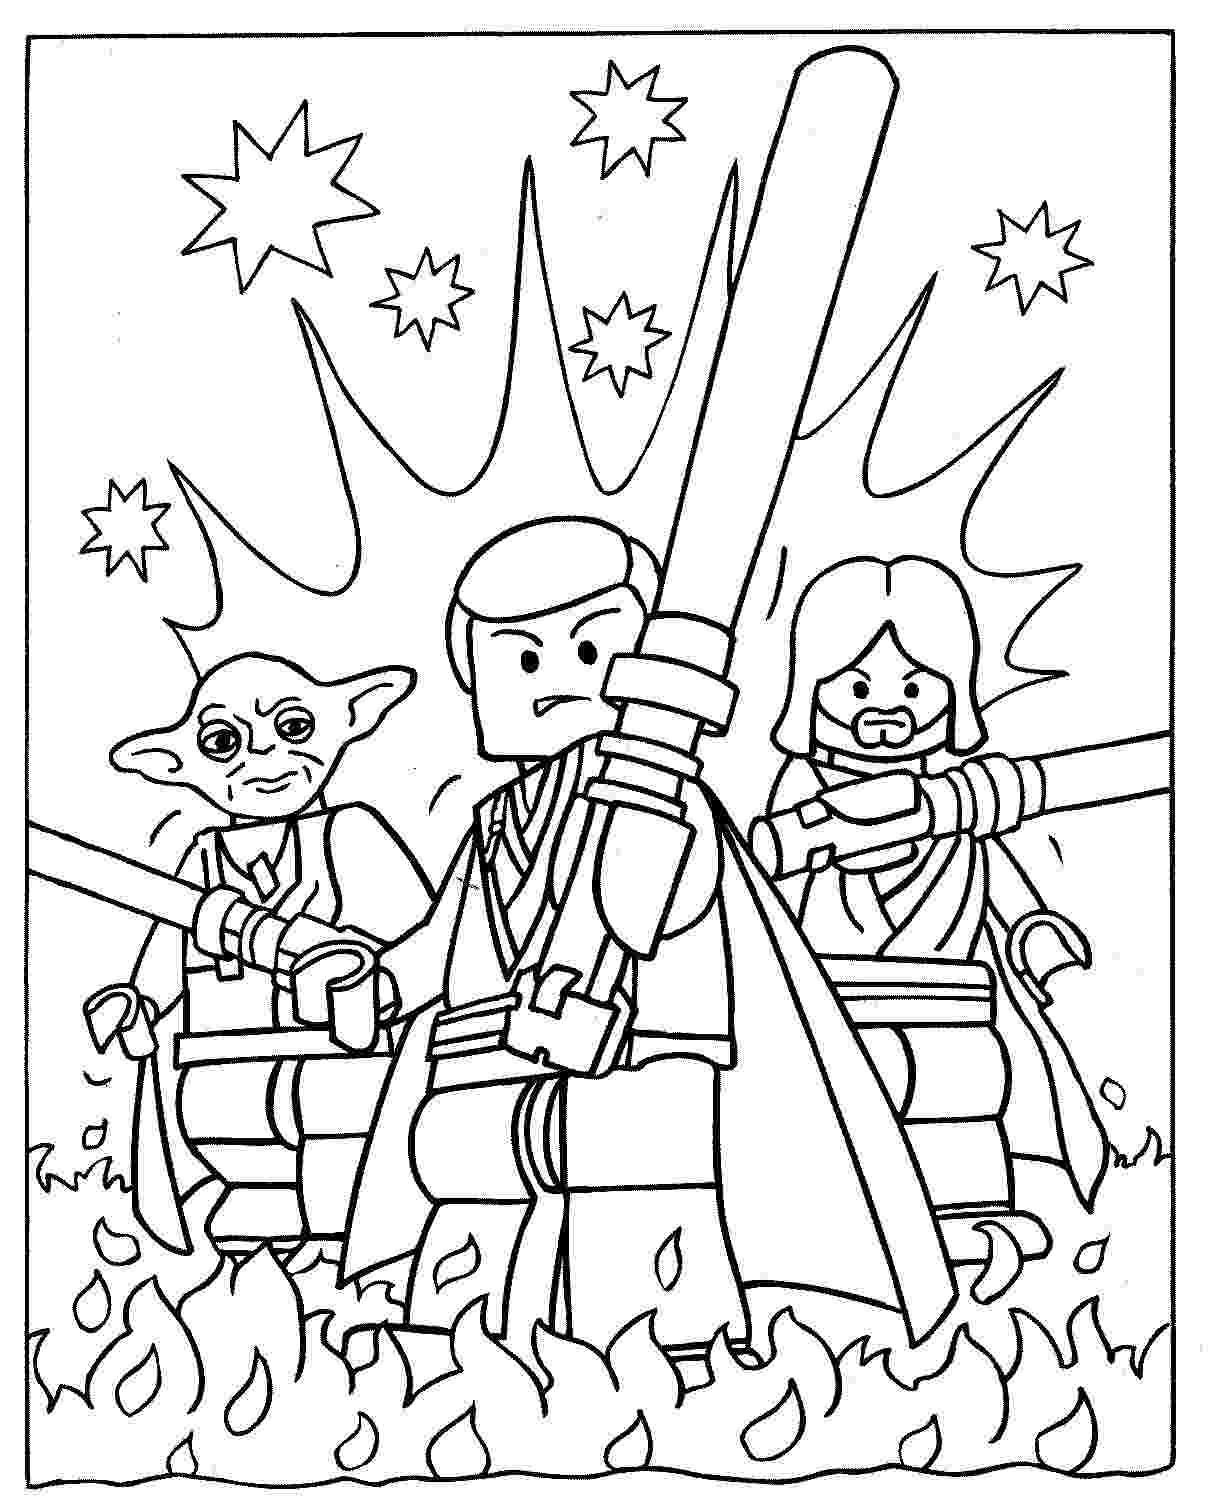 star wars printables star wars coloring pages 2018 dr odd wars printables star